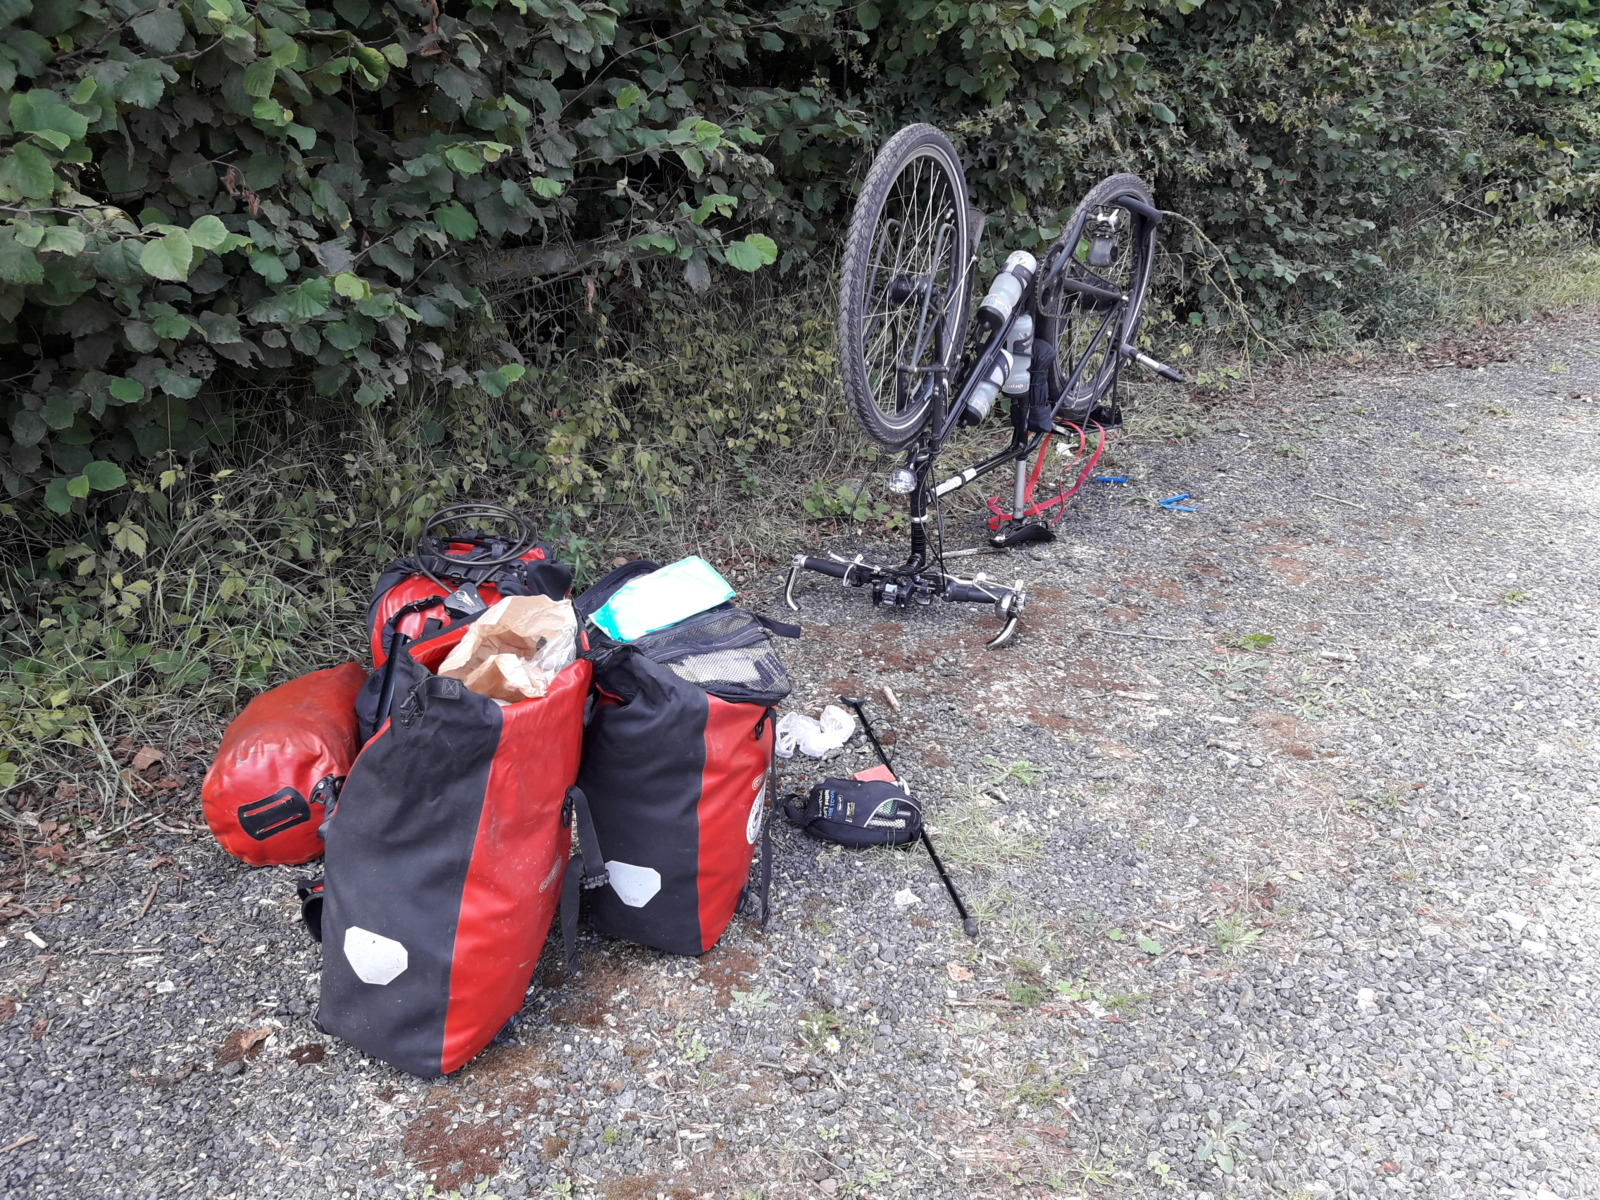 Bike and panniers